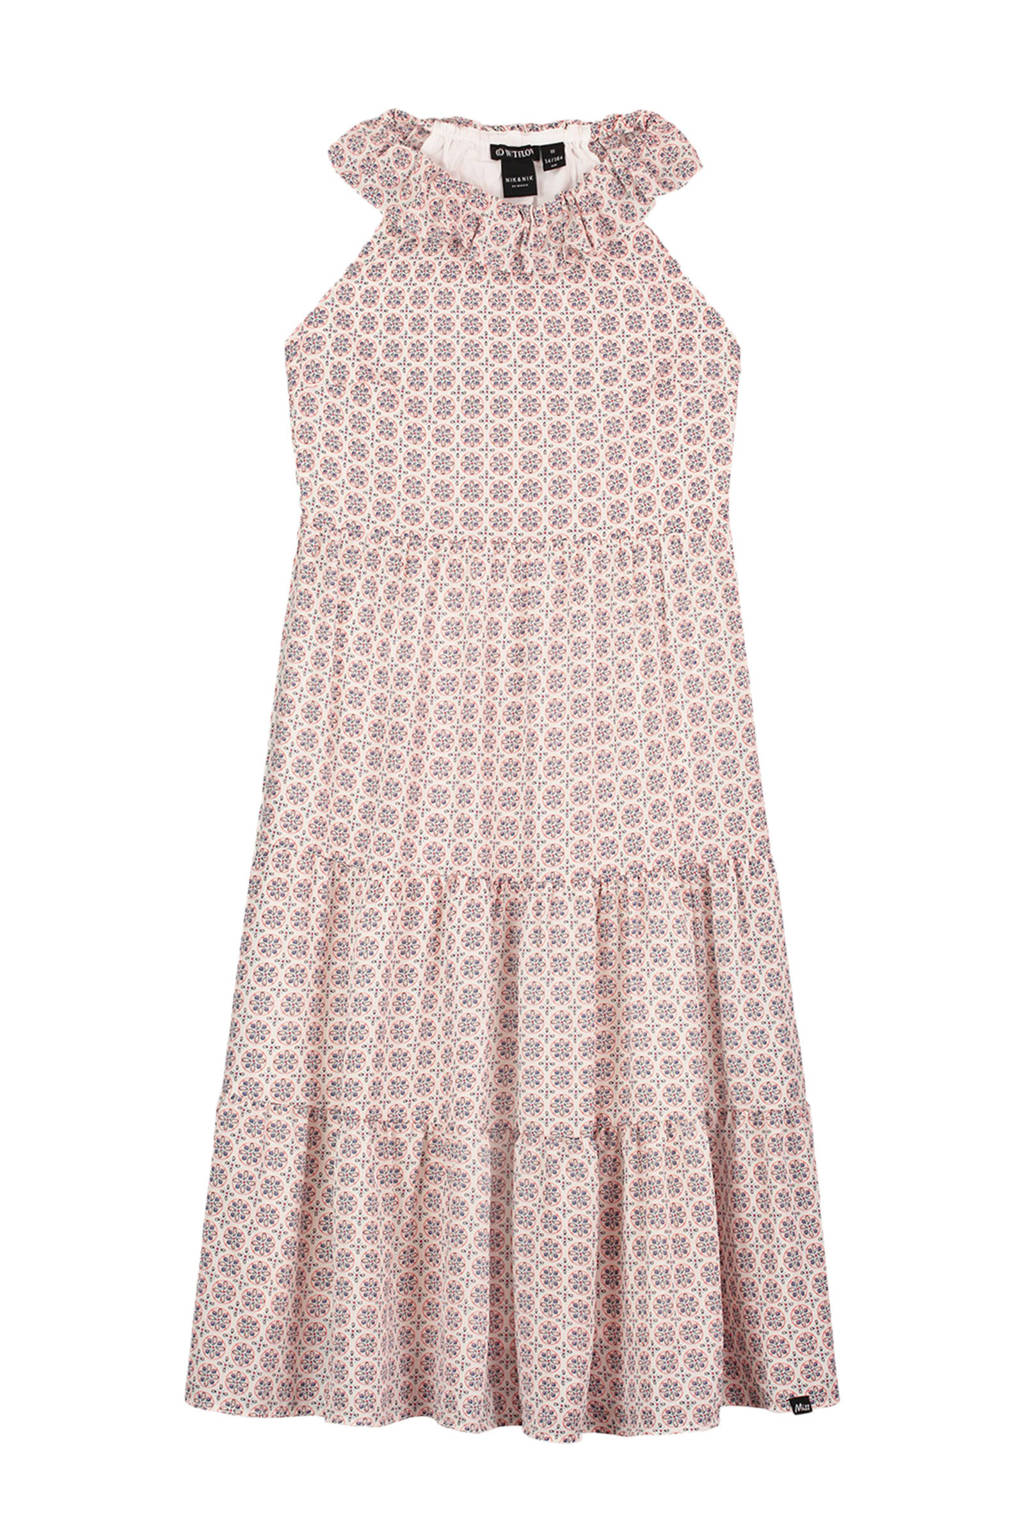 NIK&NIK jurk Dami met all over print en ruches offwhite/roze, Offwhite/roze